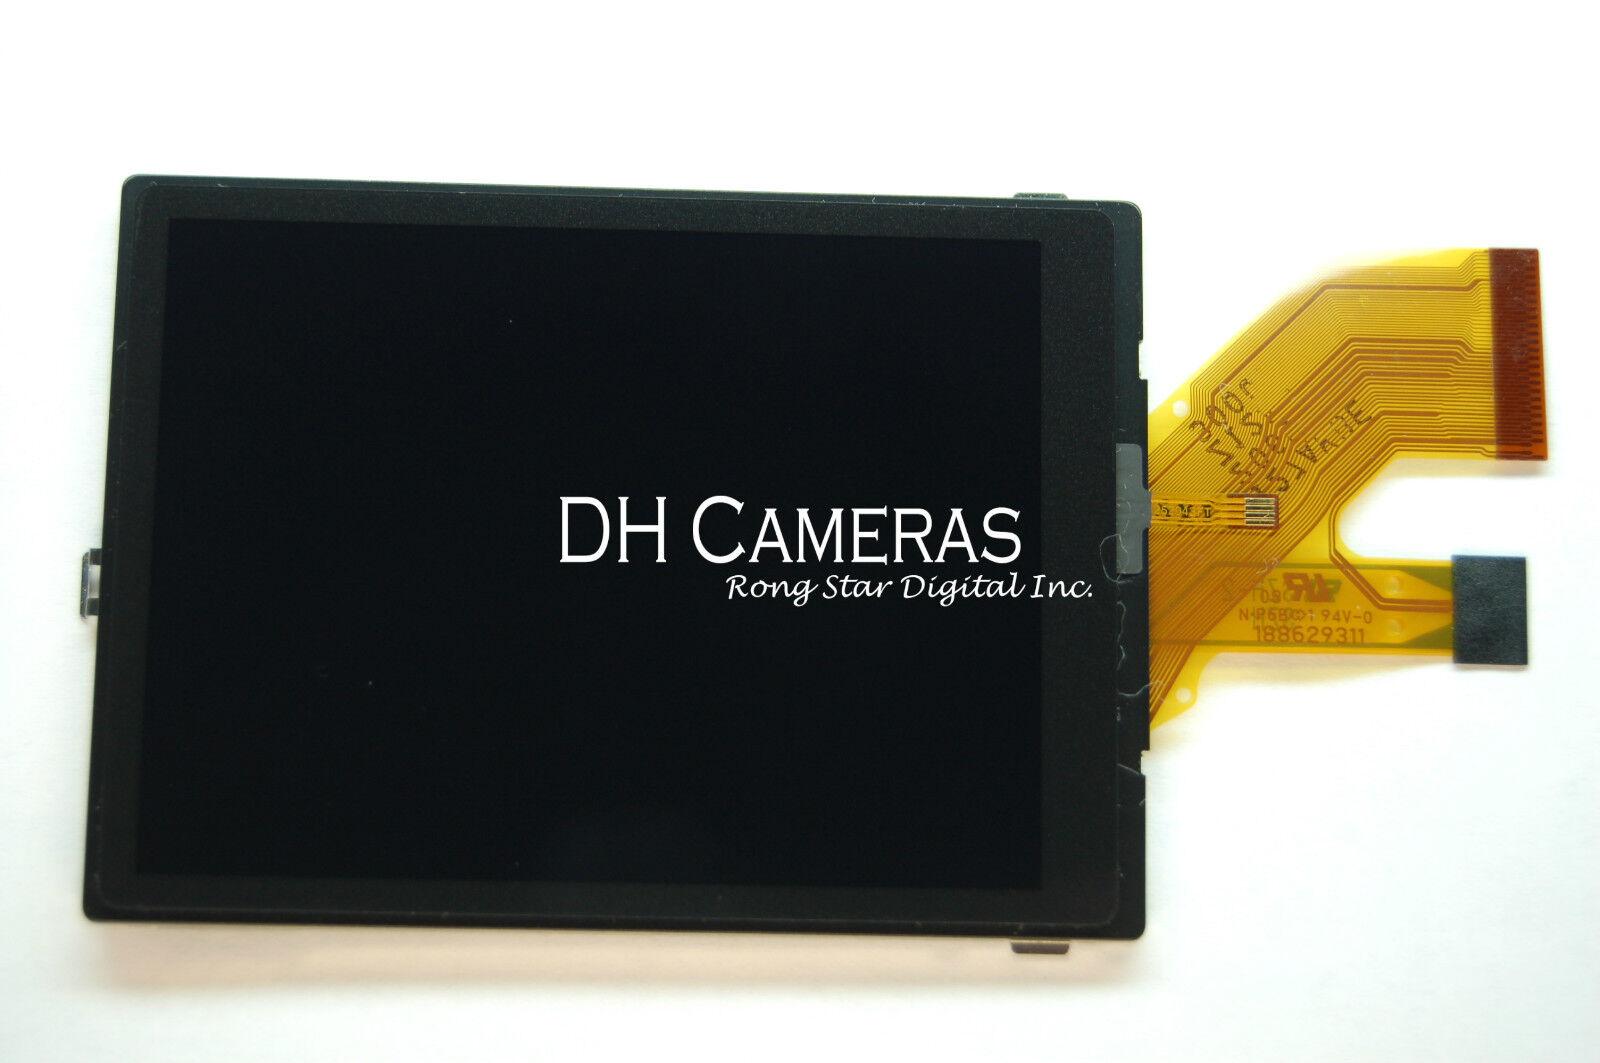 Panasonic Lumix Dmc-tz30 Zs20 Lcd Display Screen Monitor